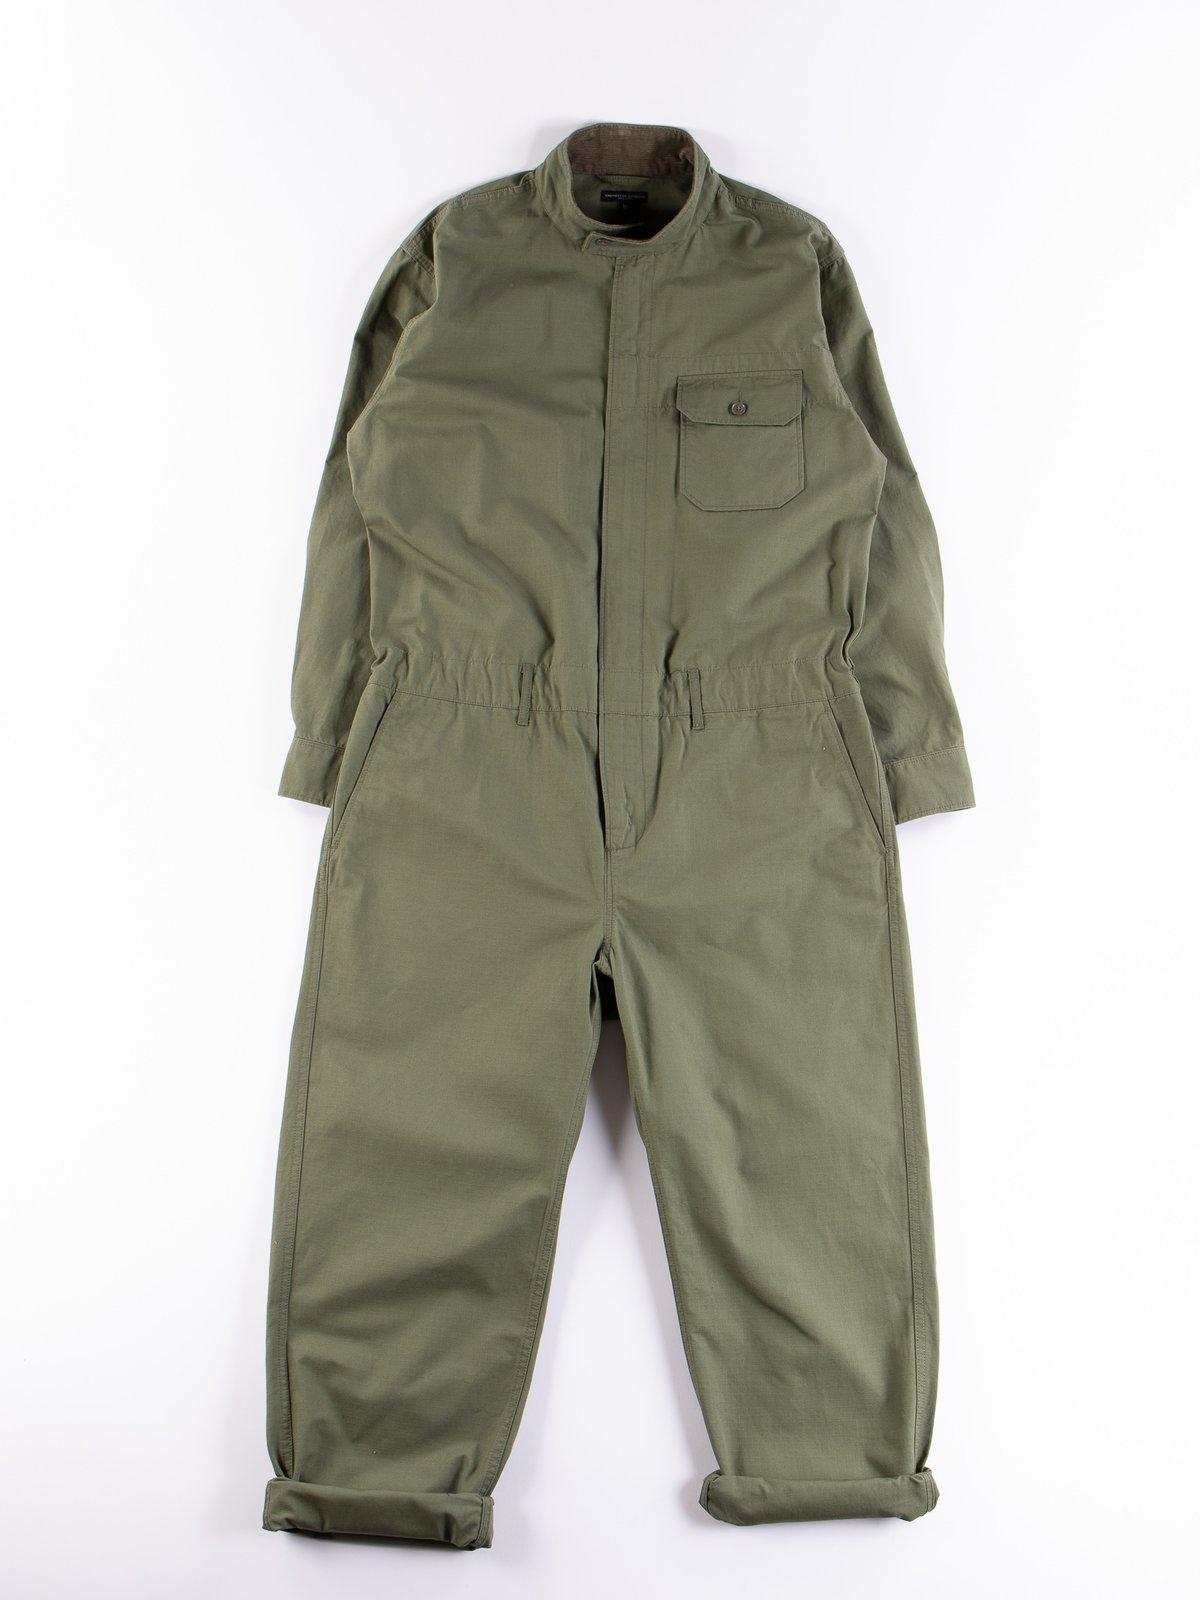 Olive Cotton Ripstop Boiler Suit - Image 1